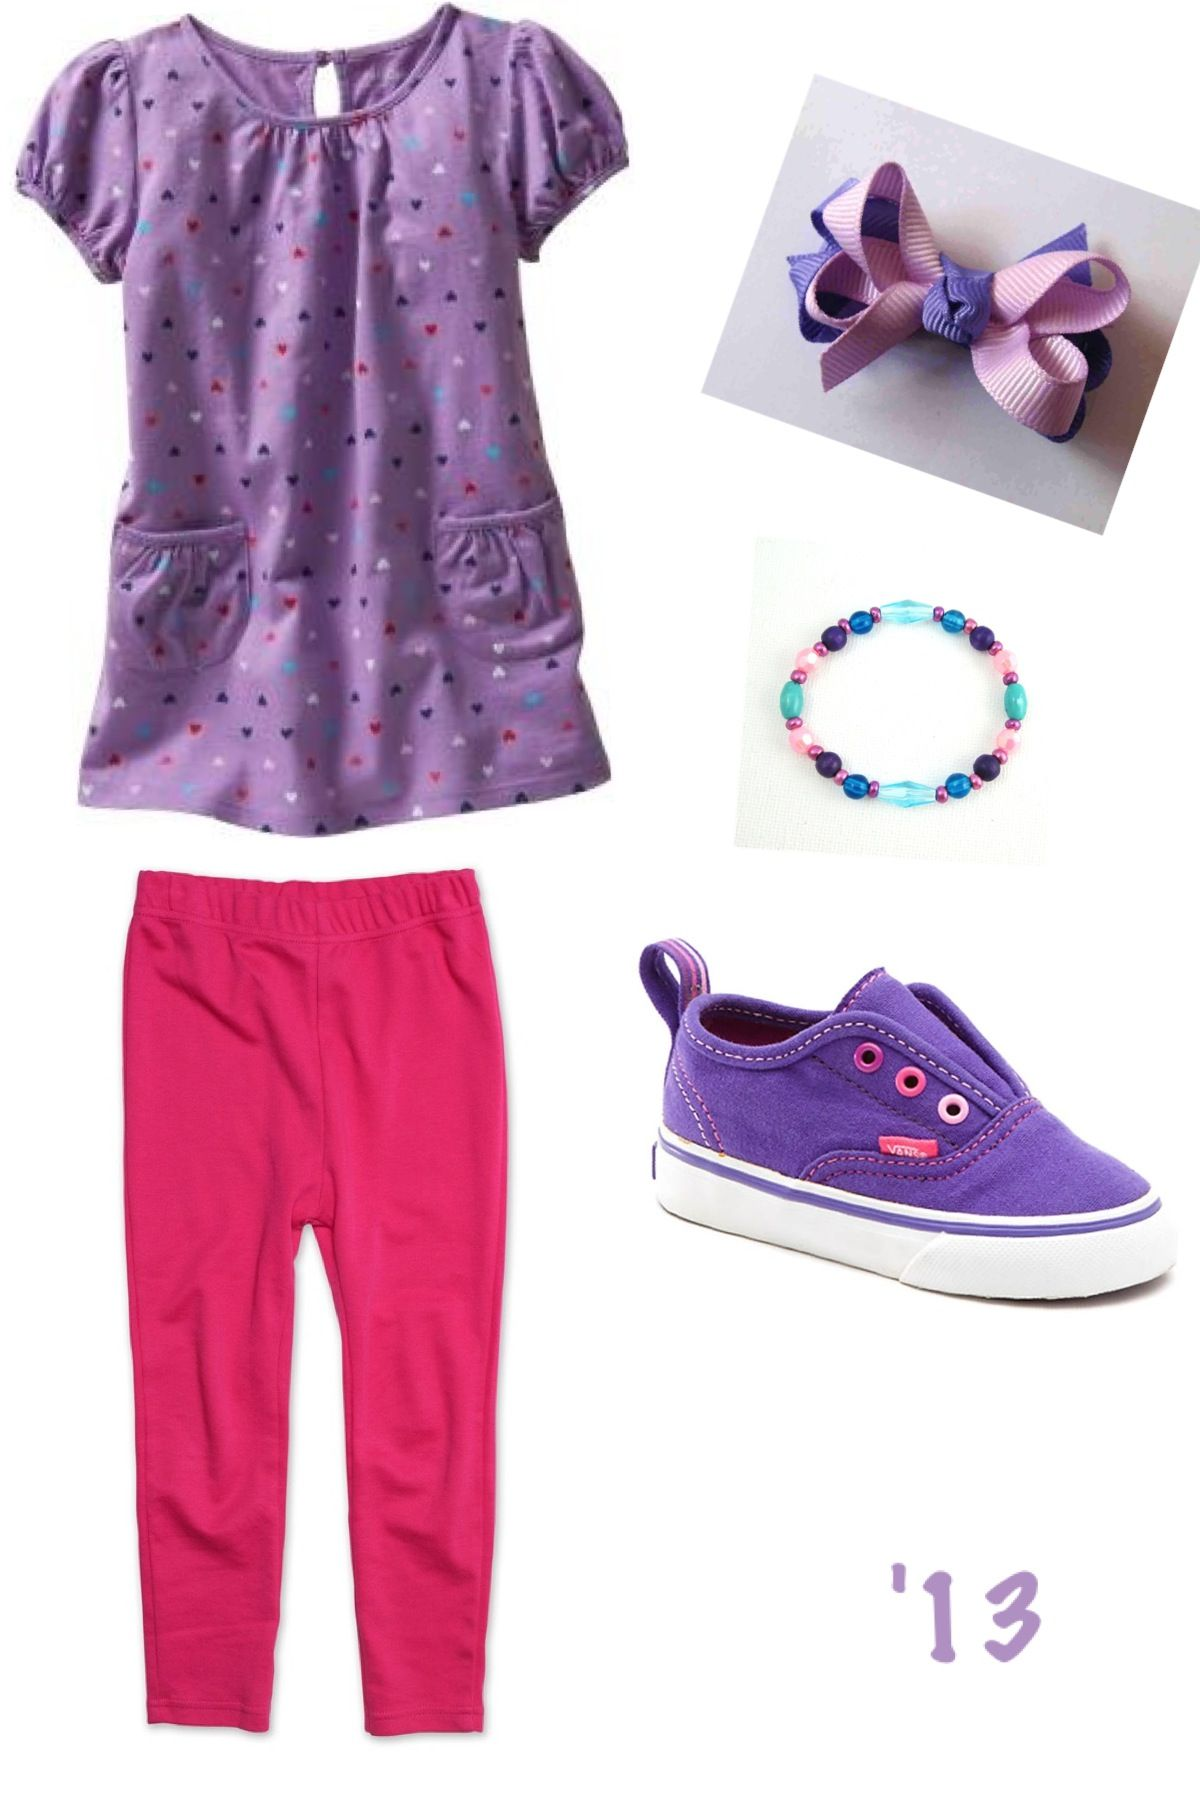 Adorable toddler girl tunic combo! #purple #pink #stylish #cute #trendy #fashionable #neat #classy #princess #flowergirl